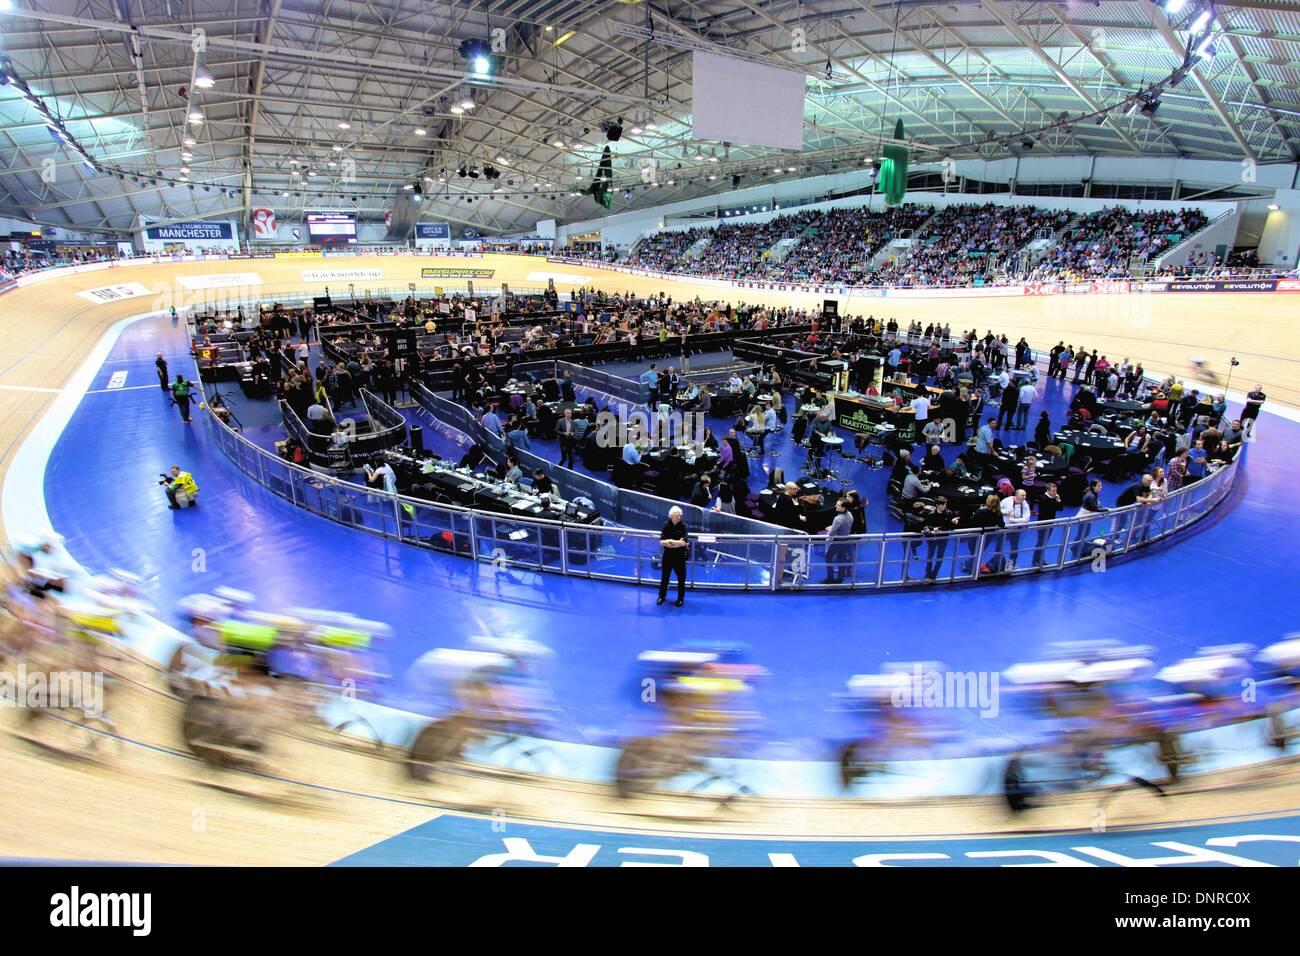 Manchester, UK. 4. Januar 2014. Revolution-Serie verfolgen Radsport Runde 3. Xxxxxx Credit: Neville Stile/Alamy Stockbild